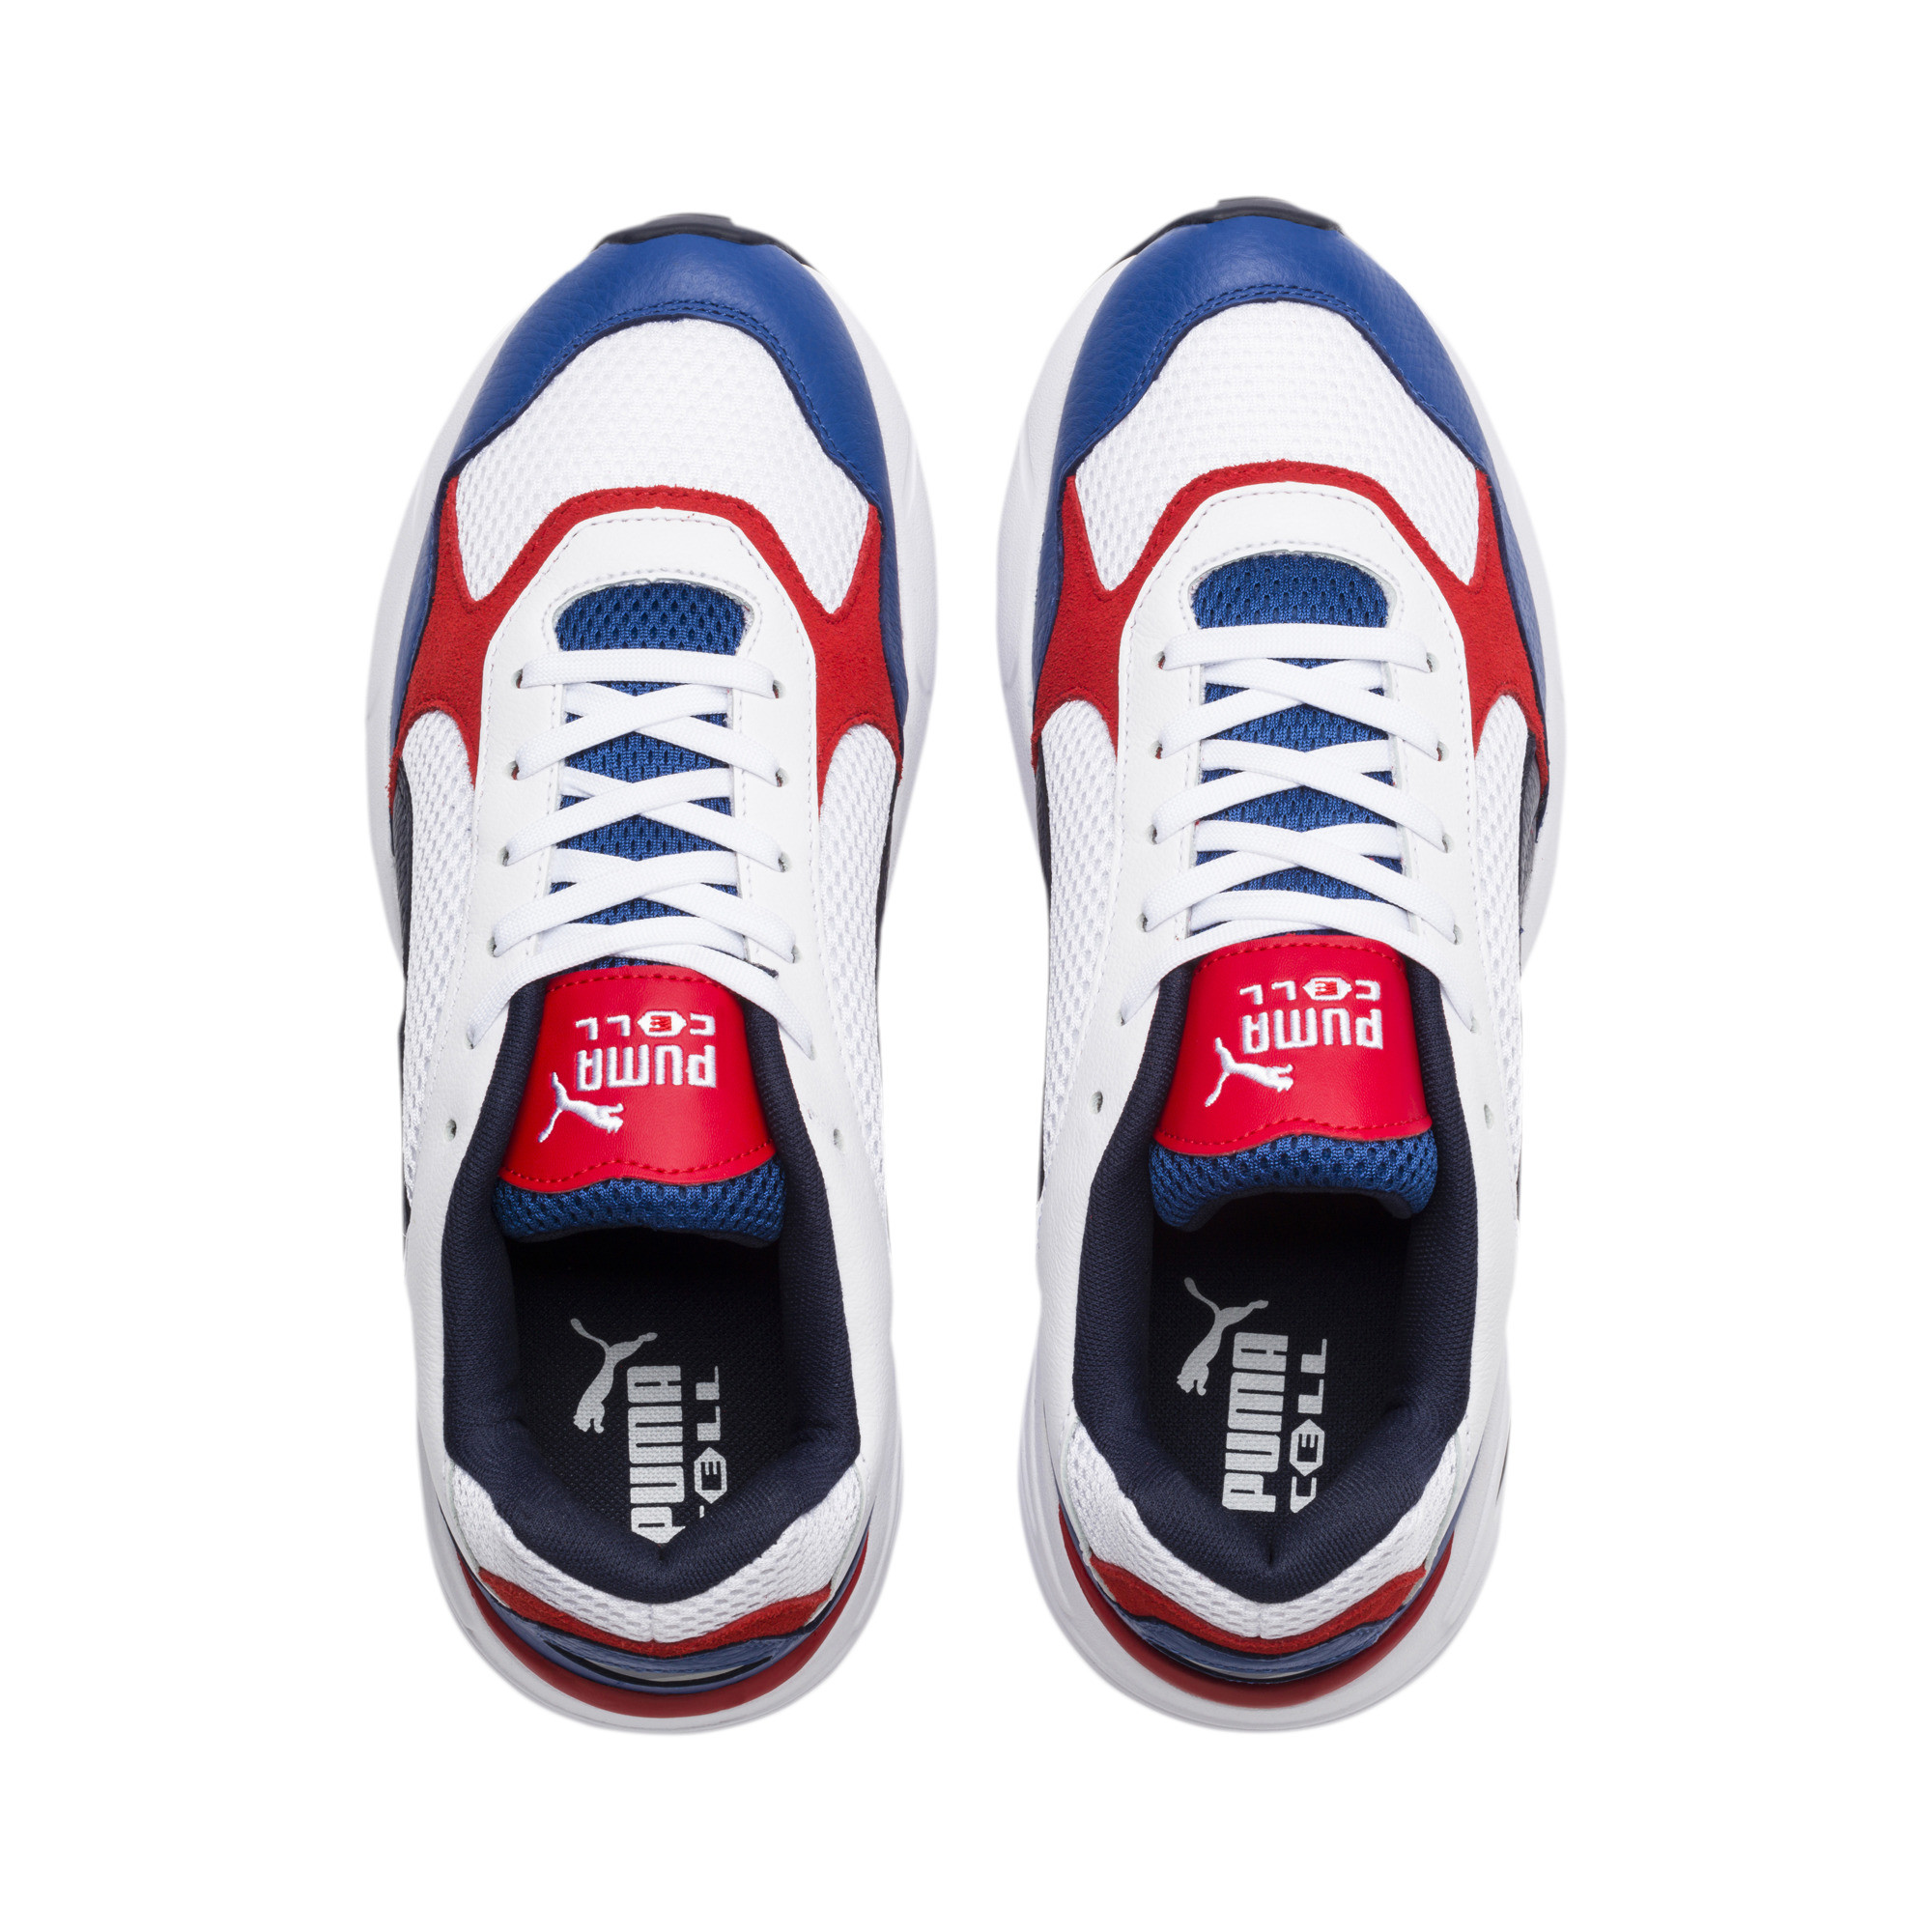 Indexbild 13 - PUMA CELL Viper Leather Sneaker Unisex Schuhe Sport Classics Neu